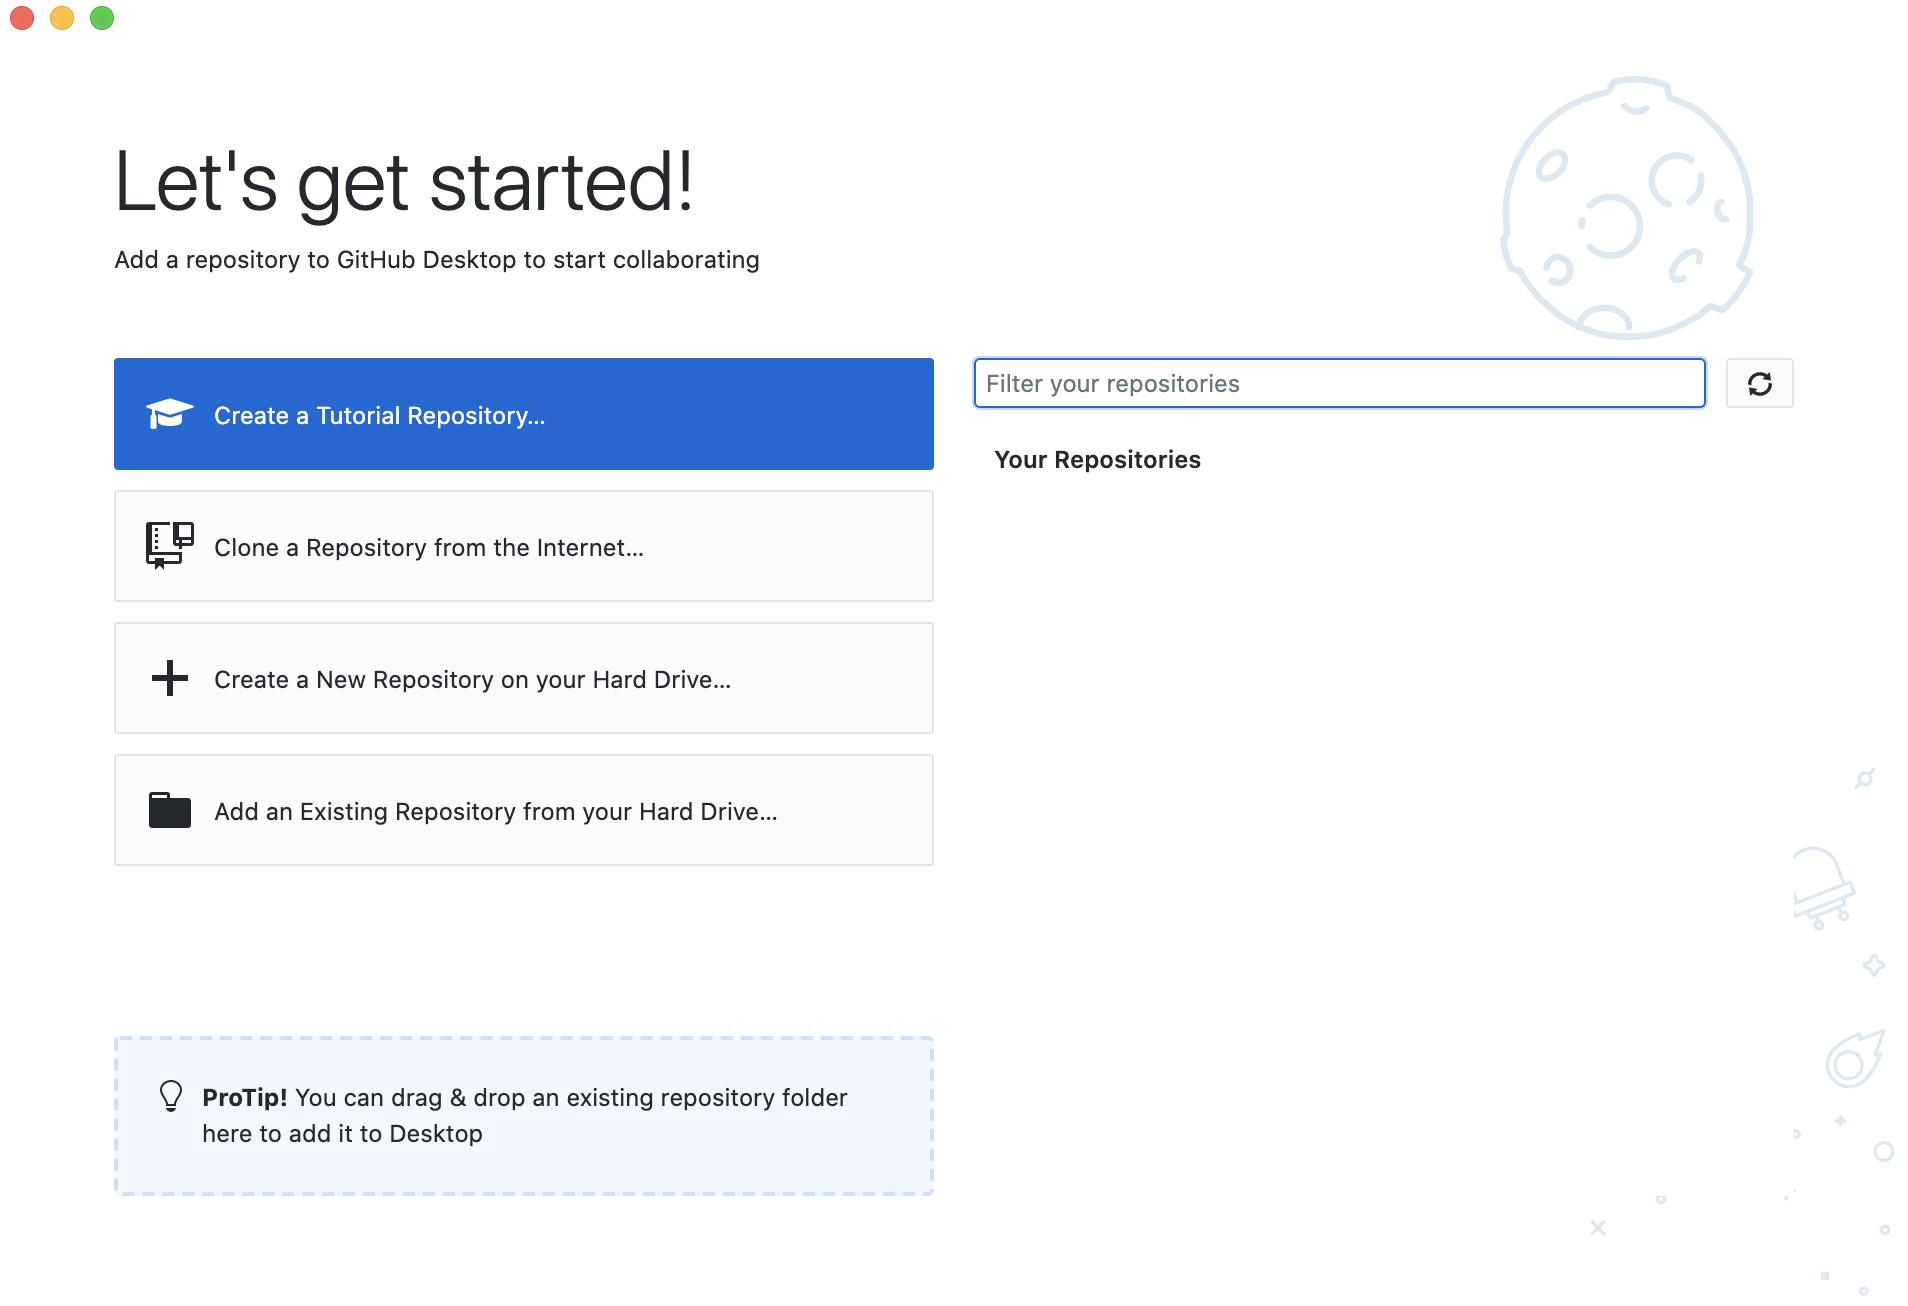 Image of GitHub Desktop window with options for creating GitHub project